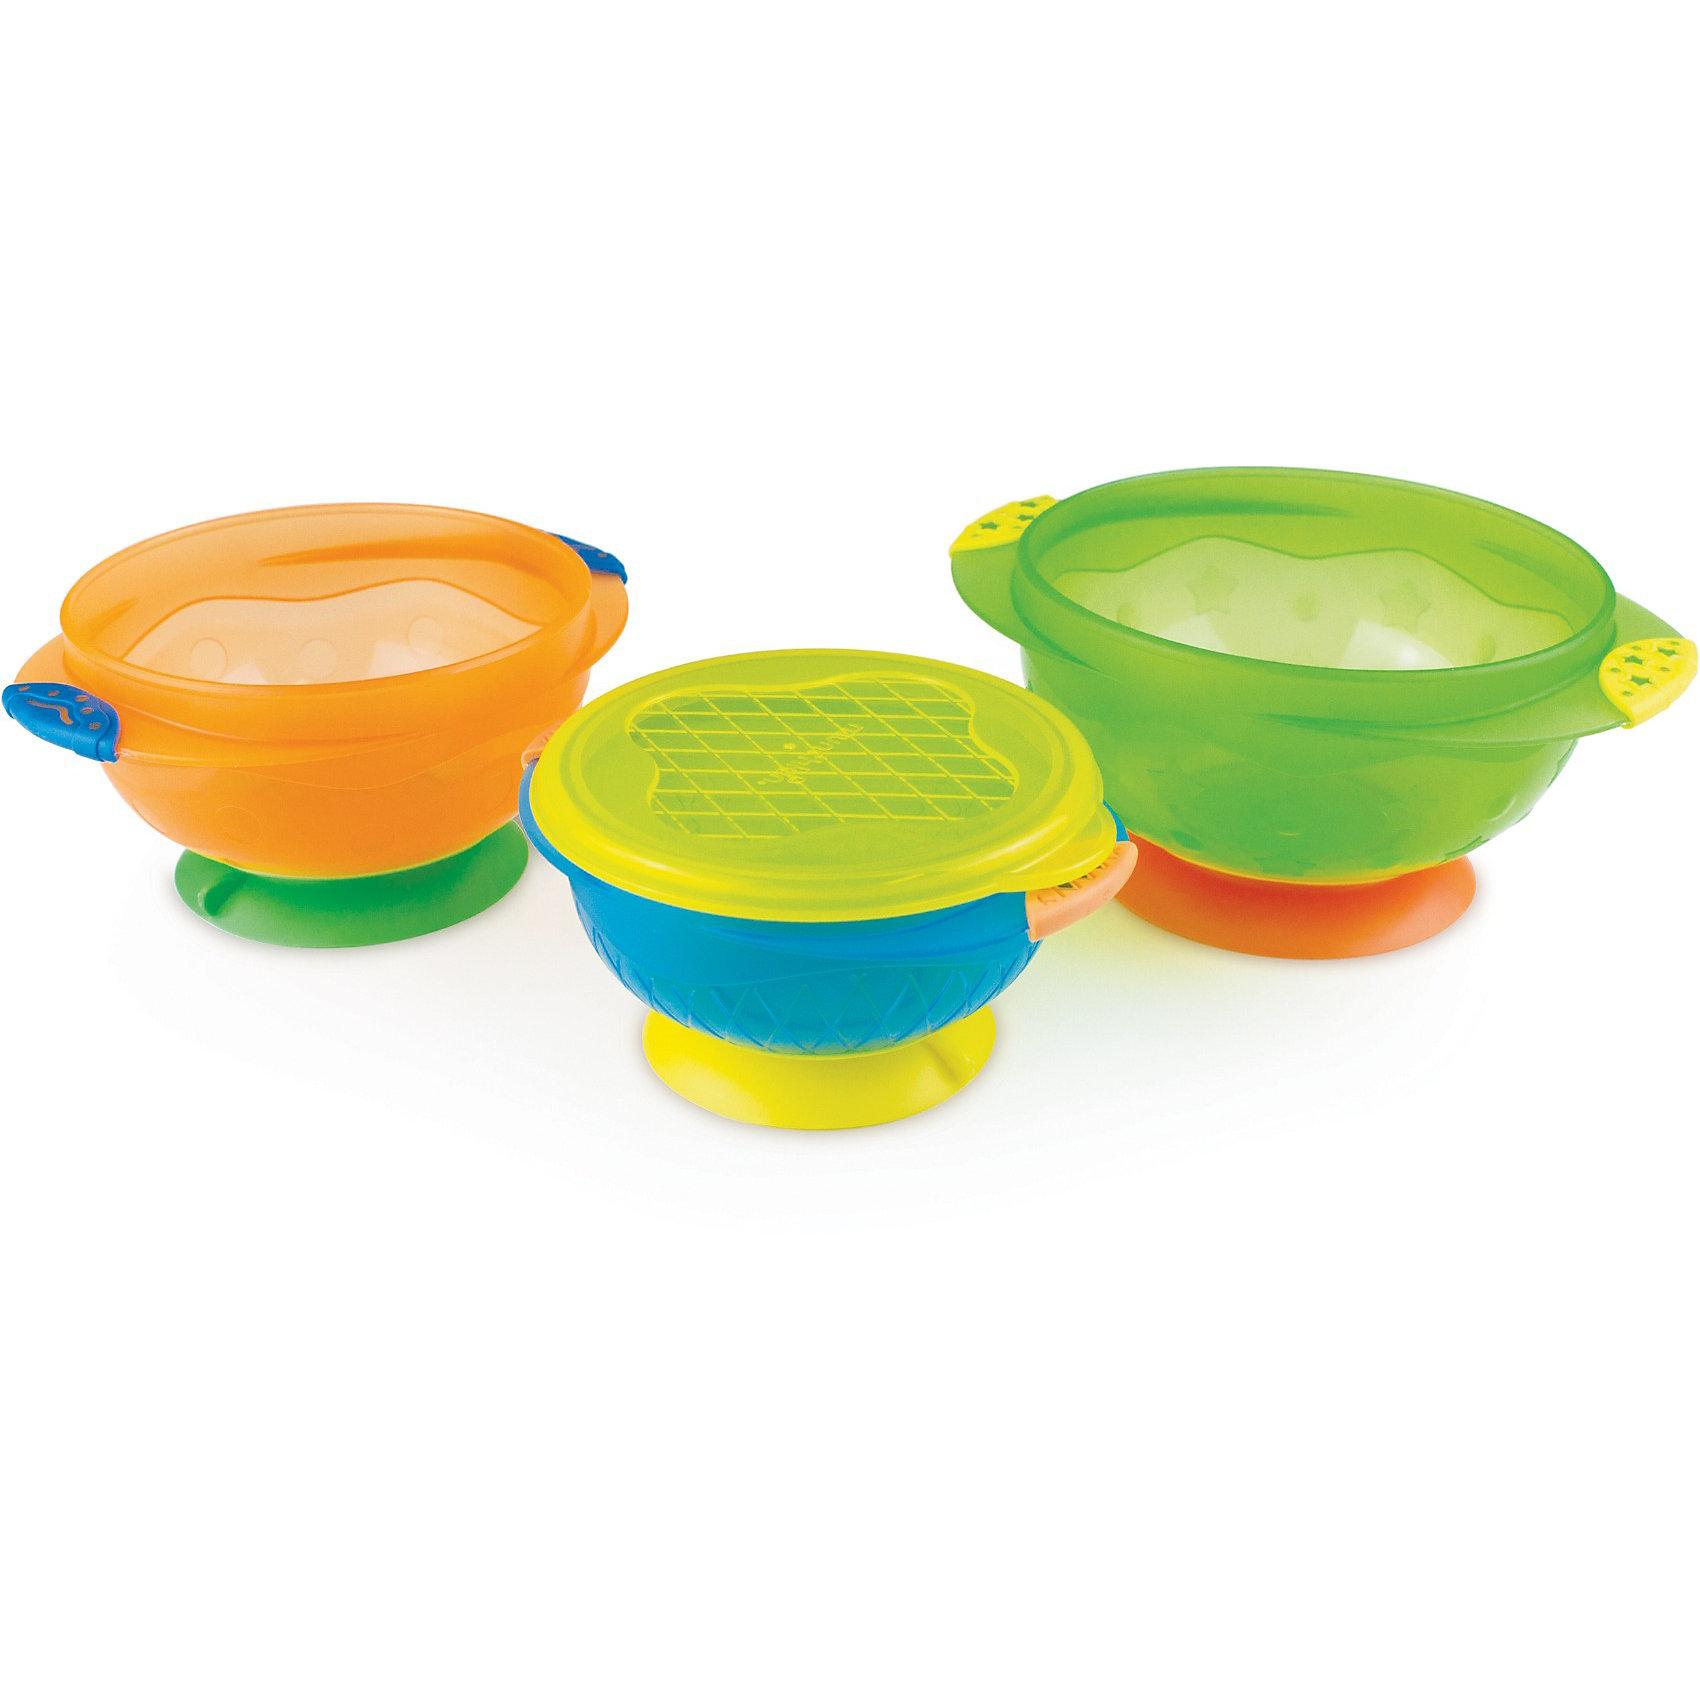 Фото munchkin Набор детских тарелок на присосках 3шт., Munchkin